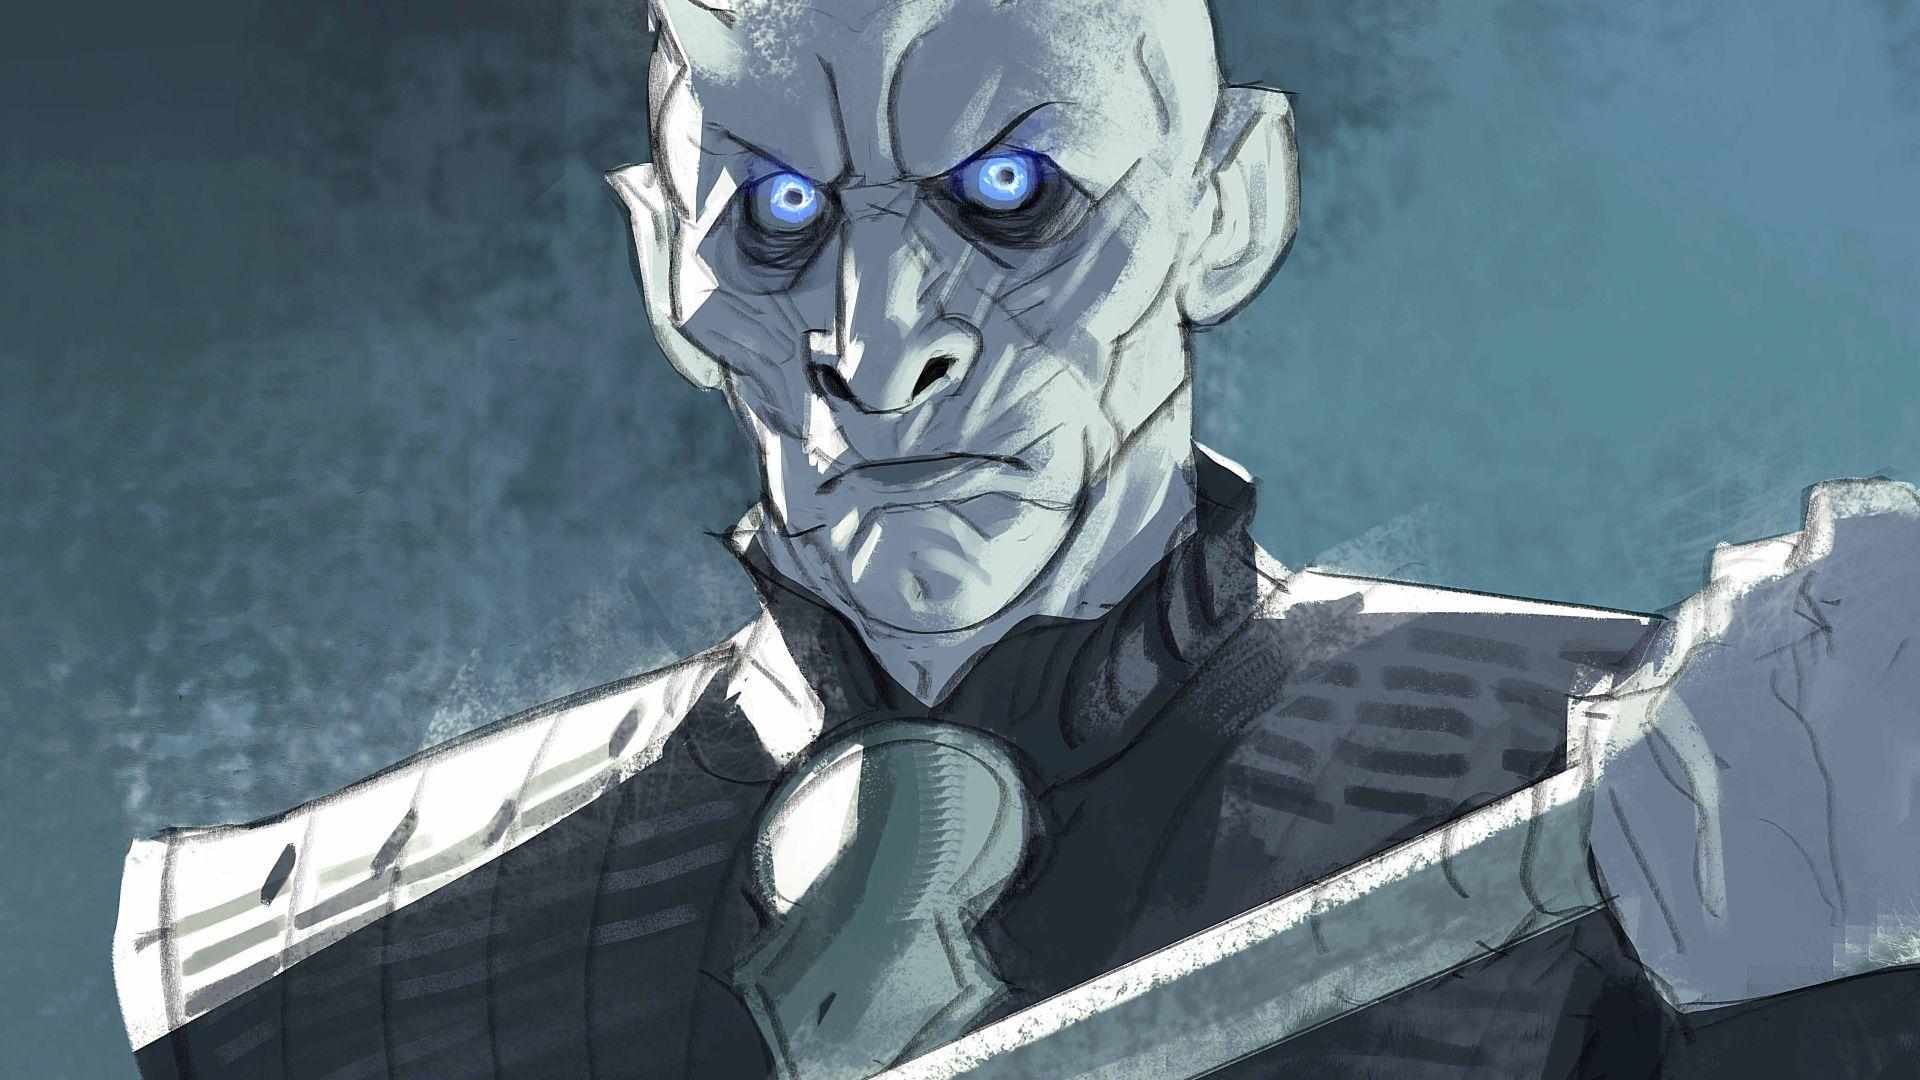 Desktop Wallpaper Night King White Walkers Game Of Thrones Fan